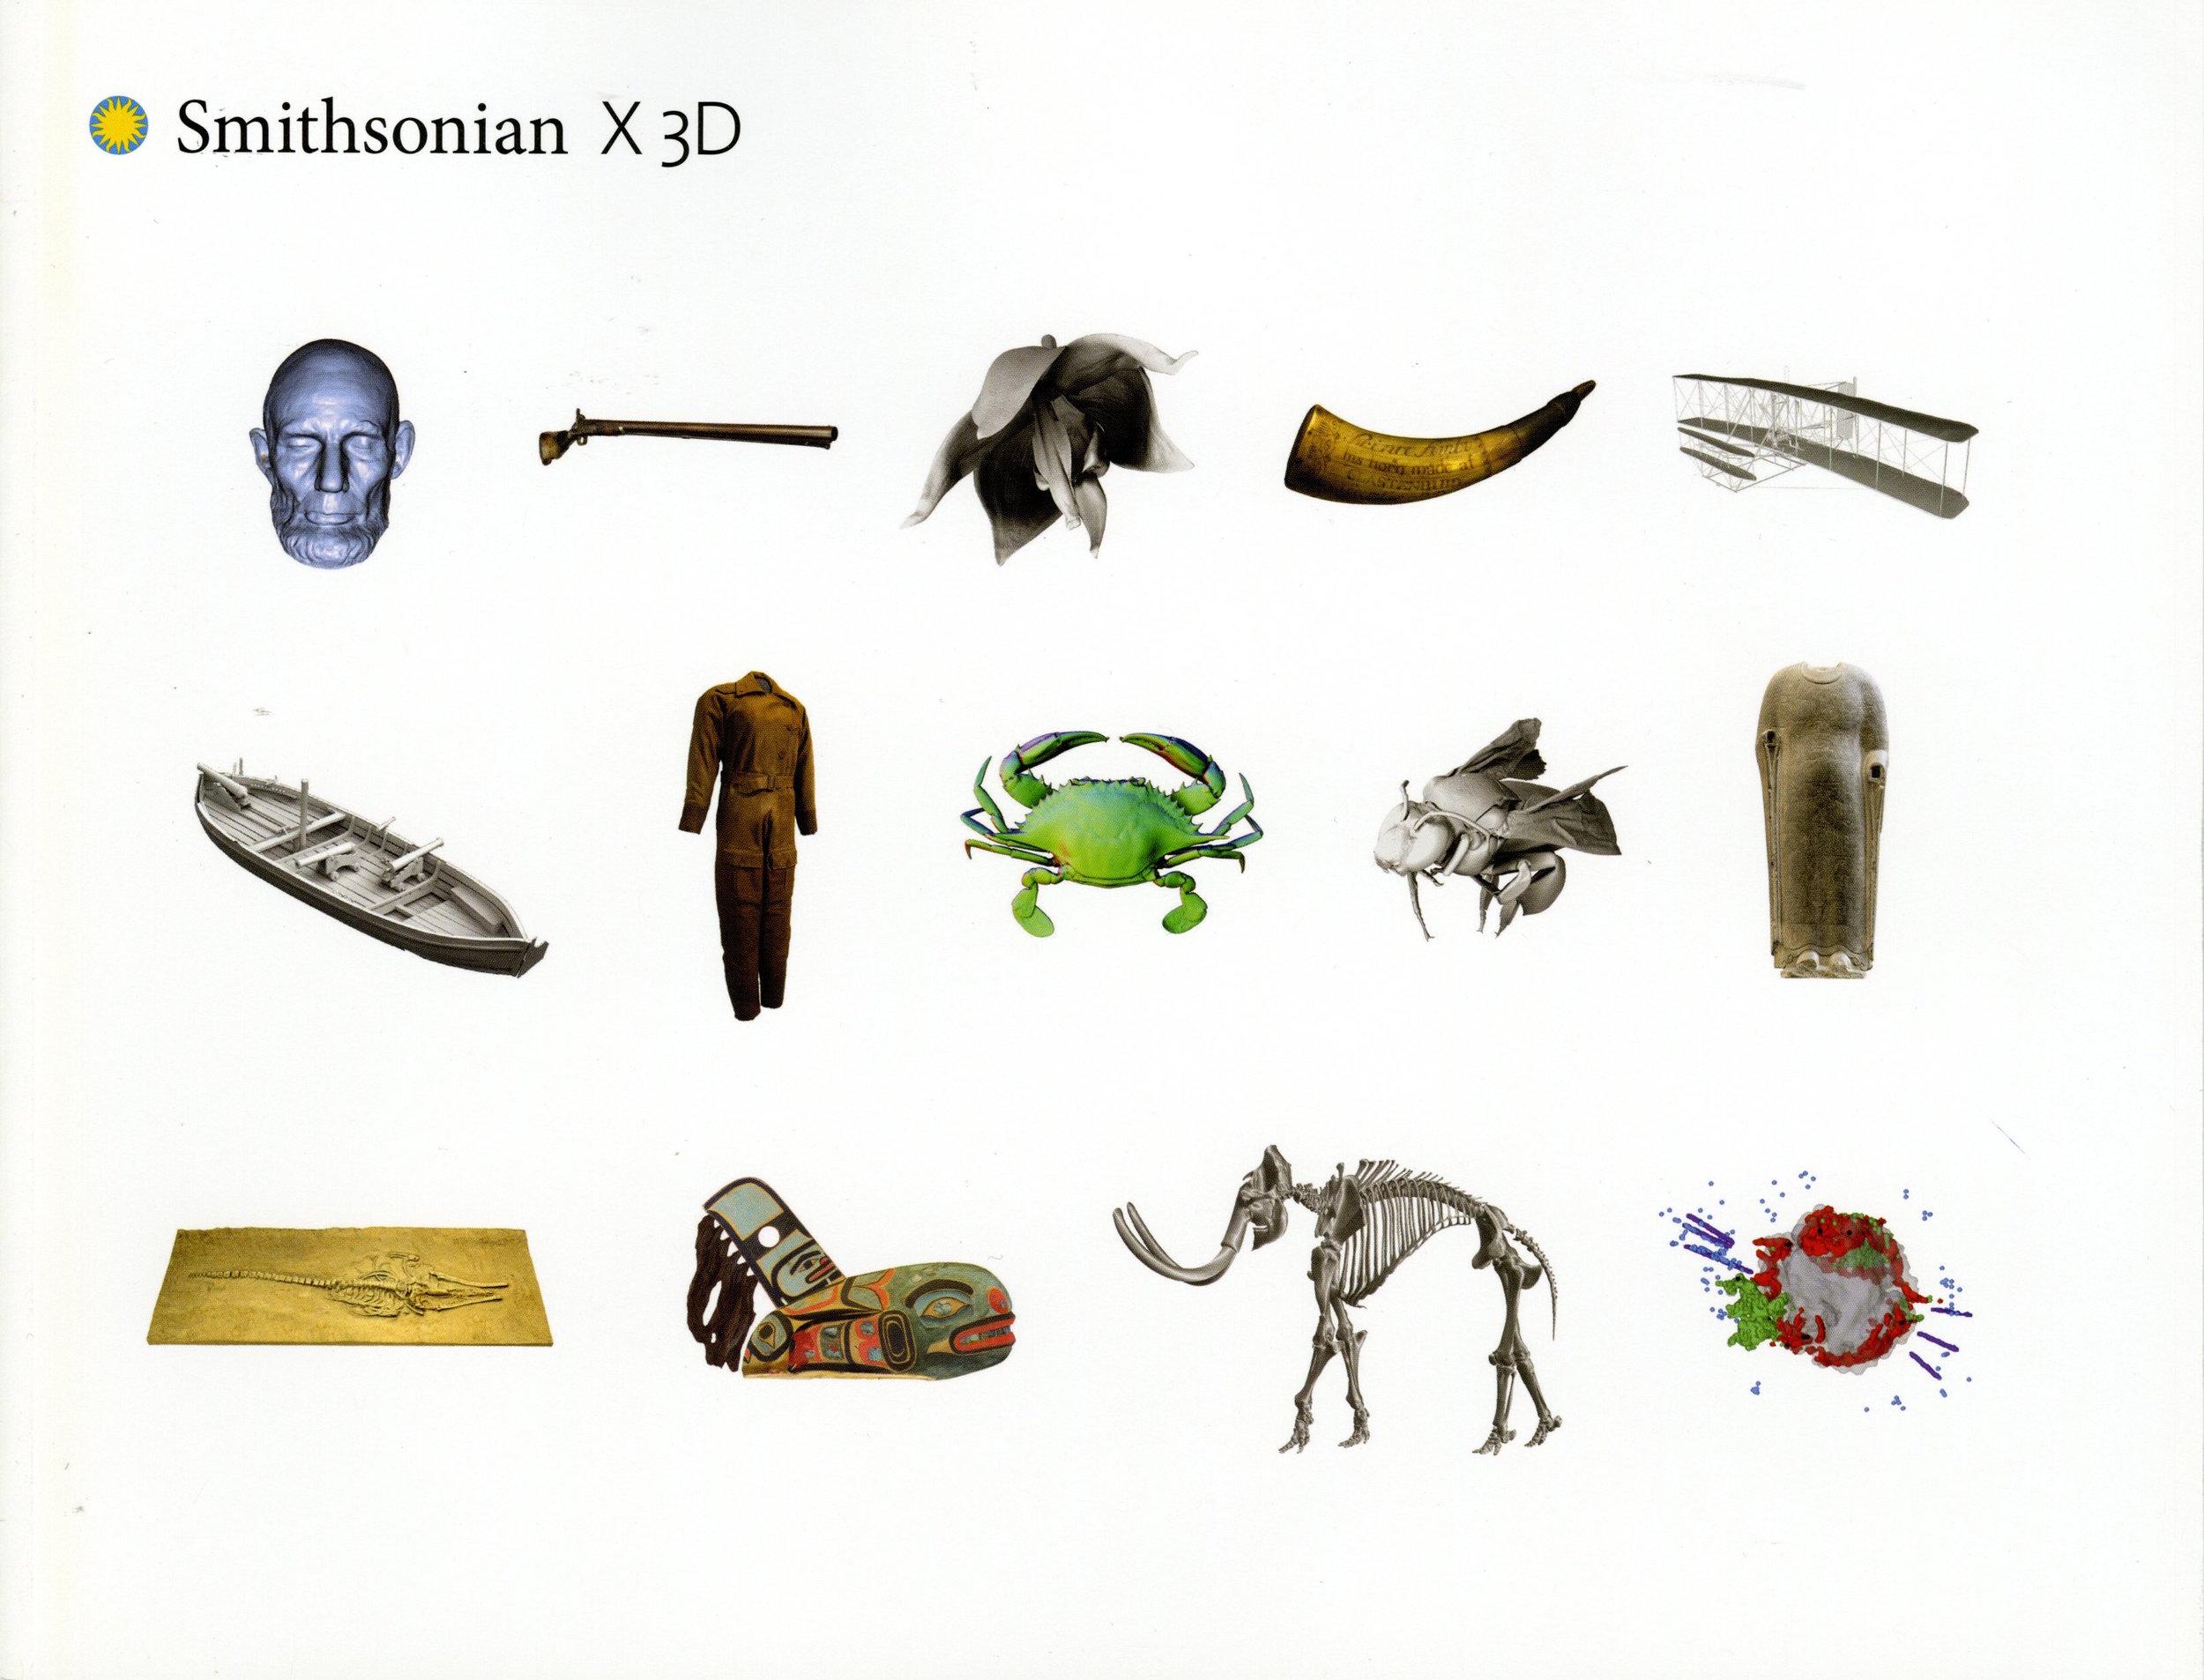 Smithsonian X 3D Book